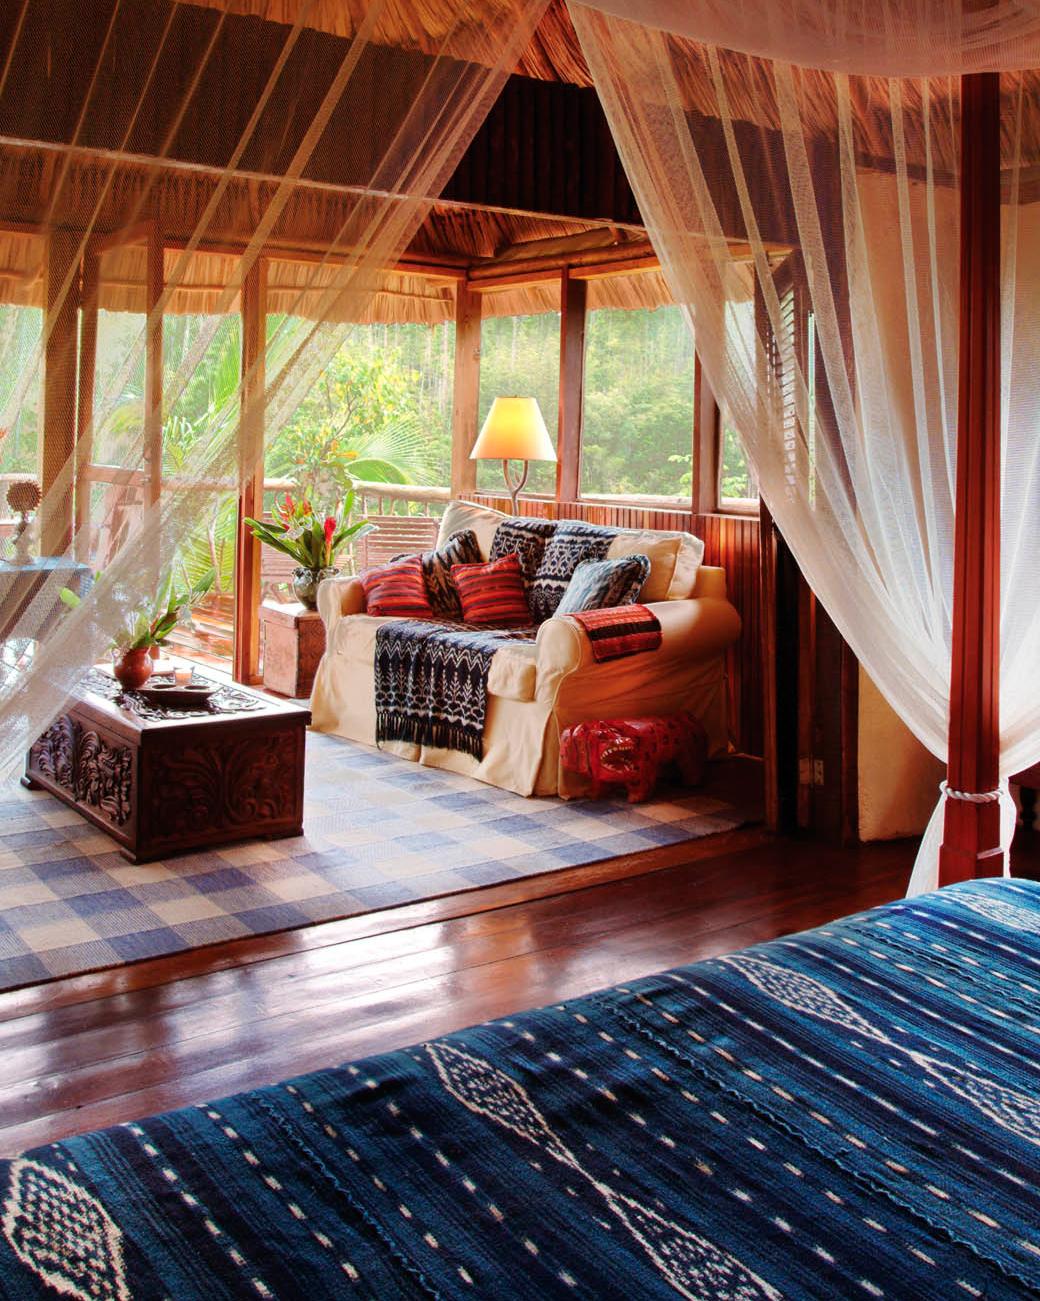 honeymoon-destinations-2015-belize-blancaneux-lodge-room-0115.jpg